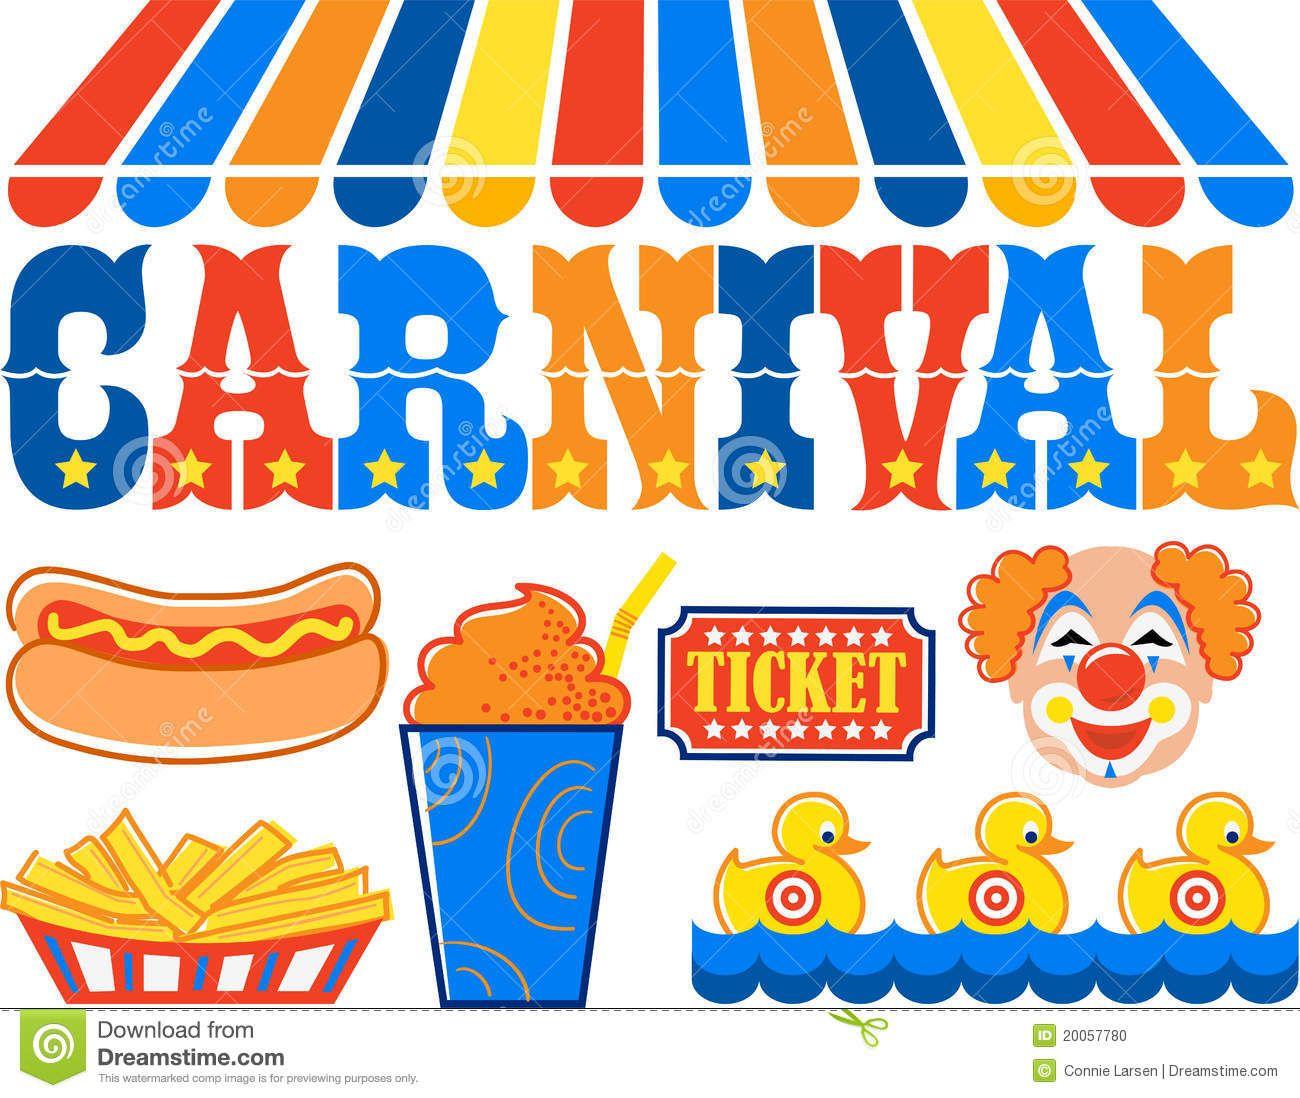 Carnival clipart carnival games. Headline illustration of the